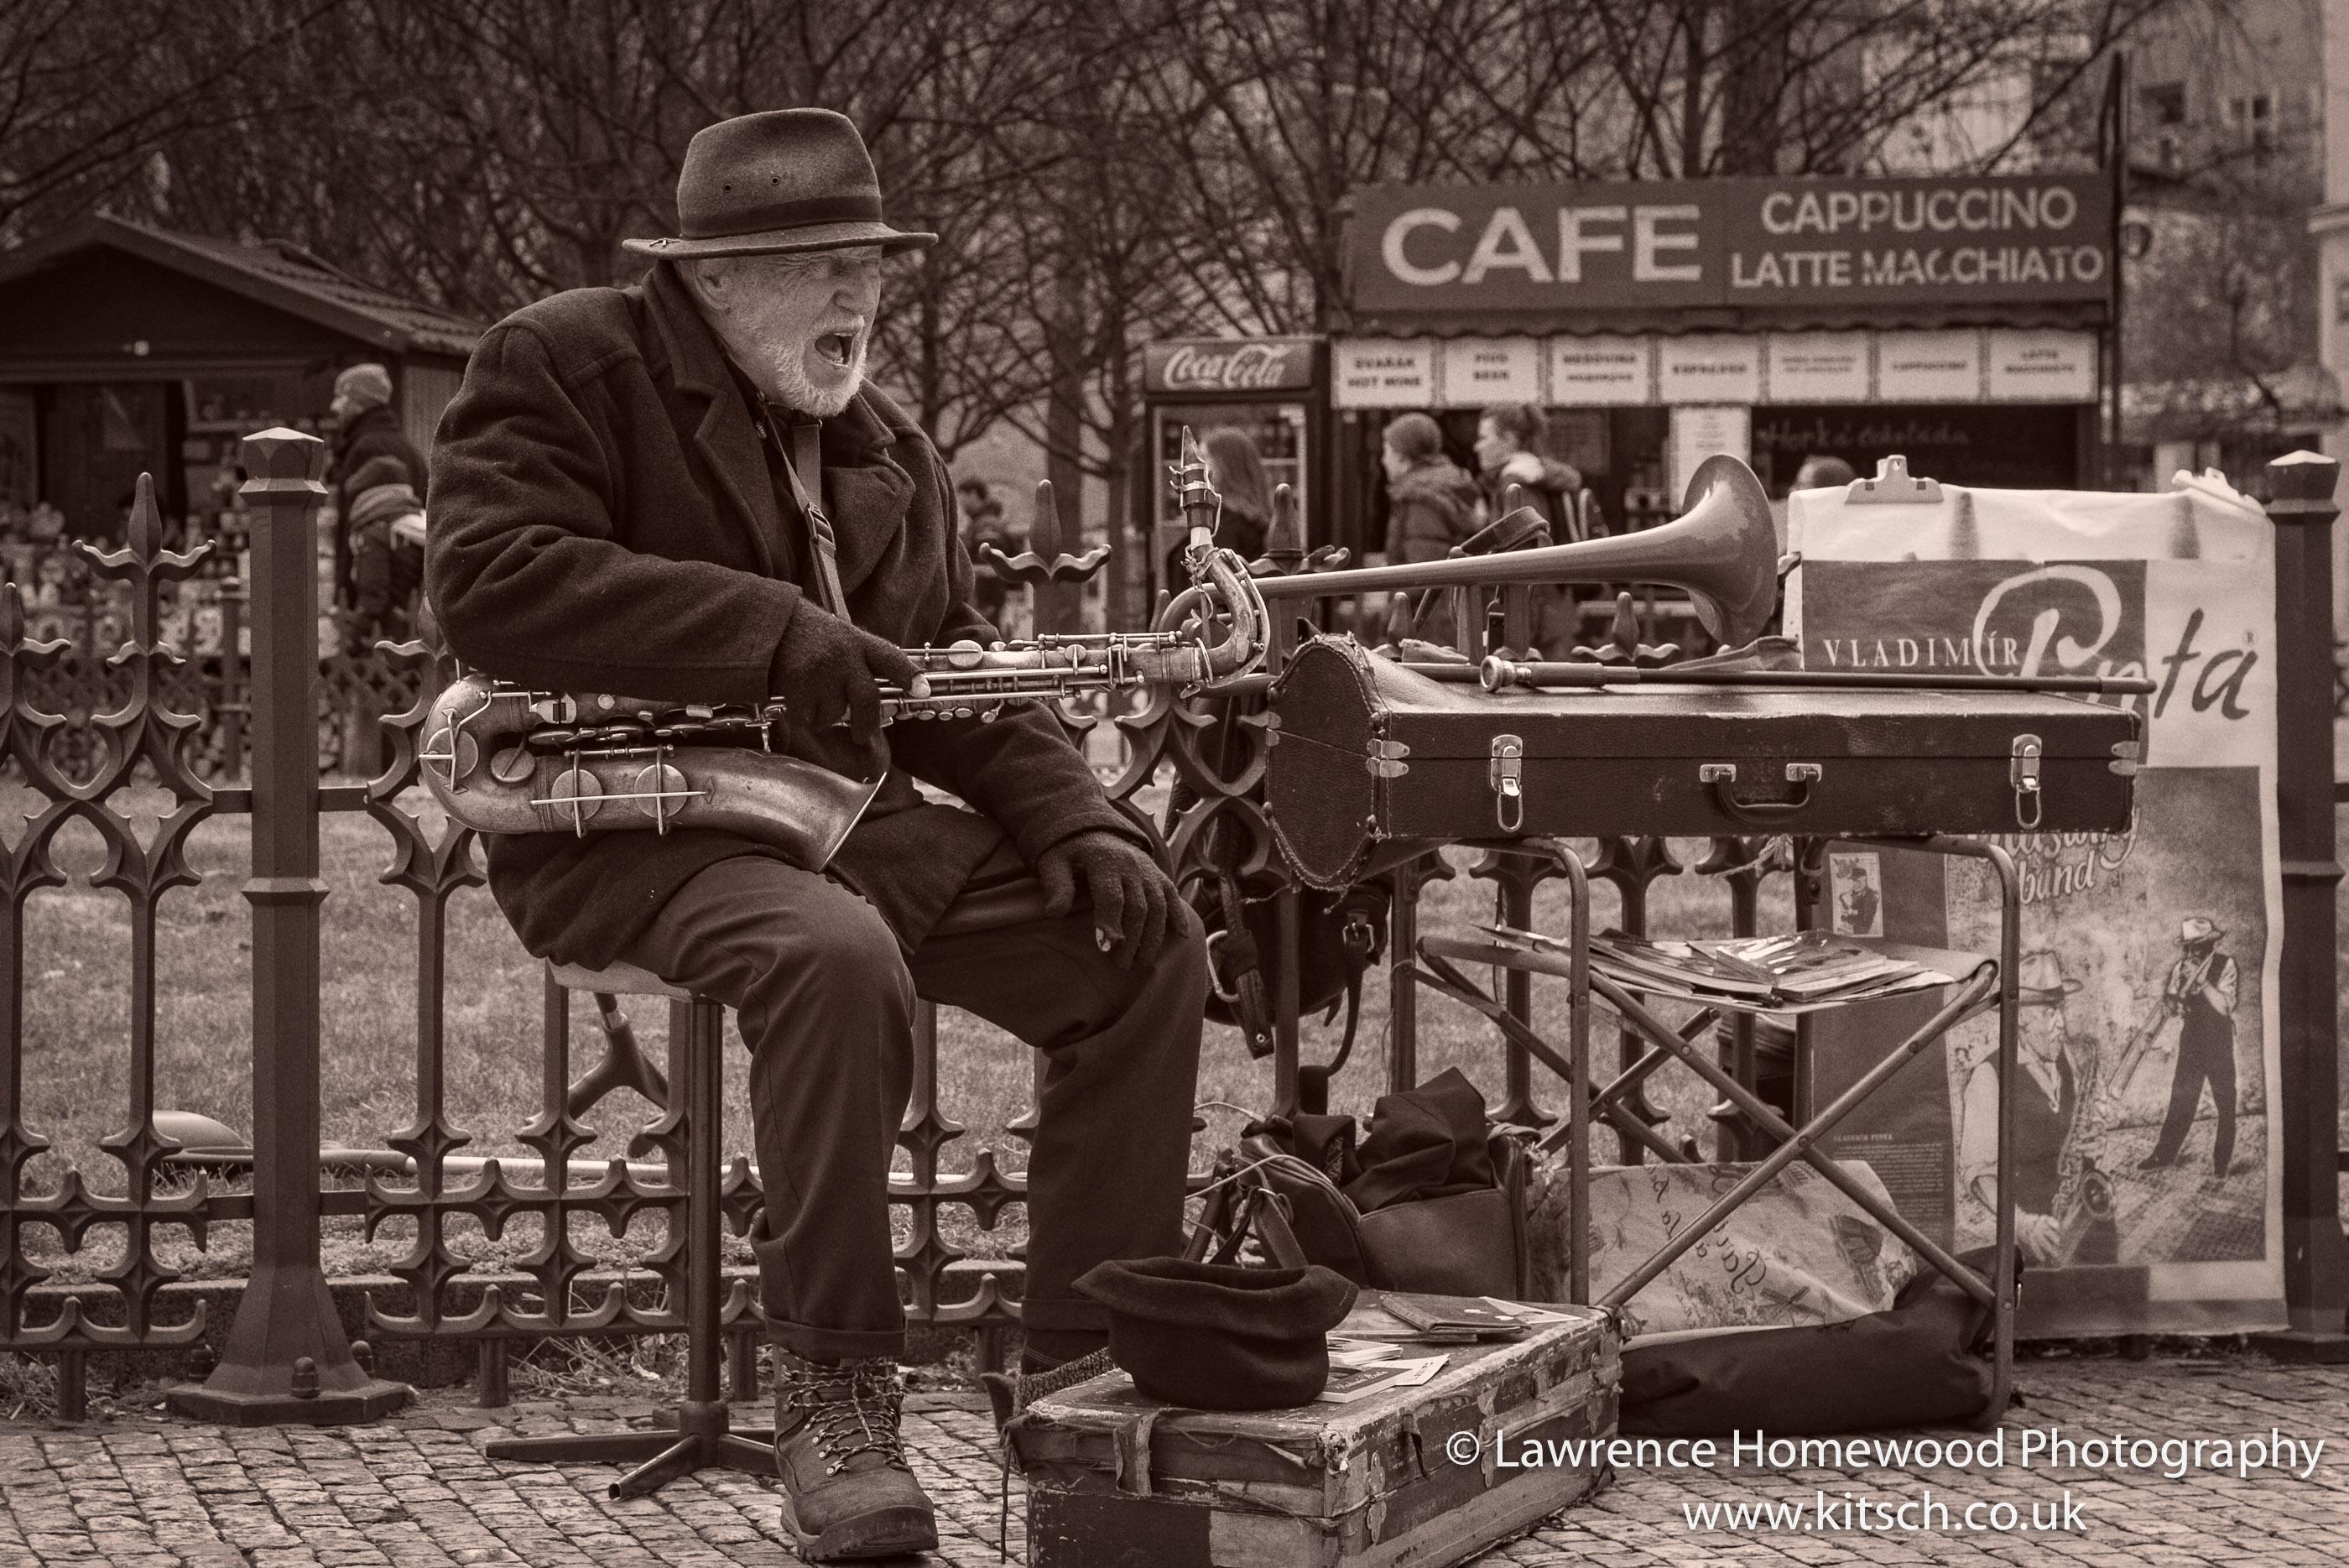 Vladimir Pinta - Cappuccino Jazz